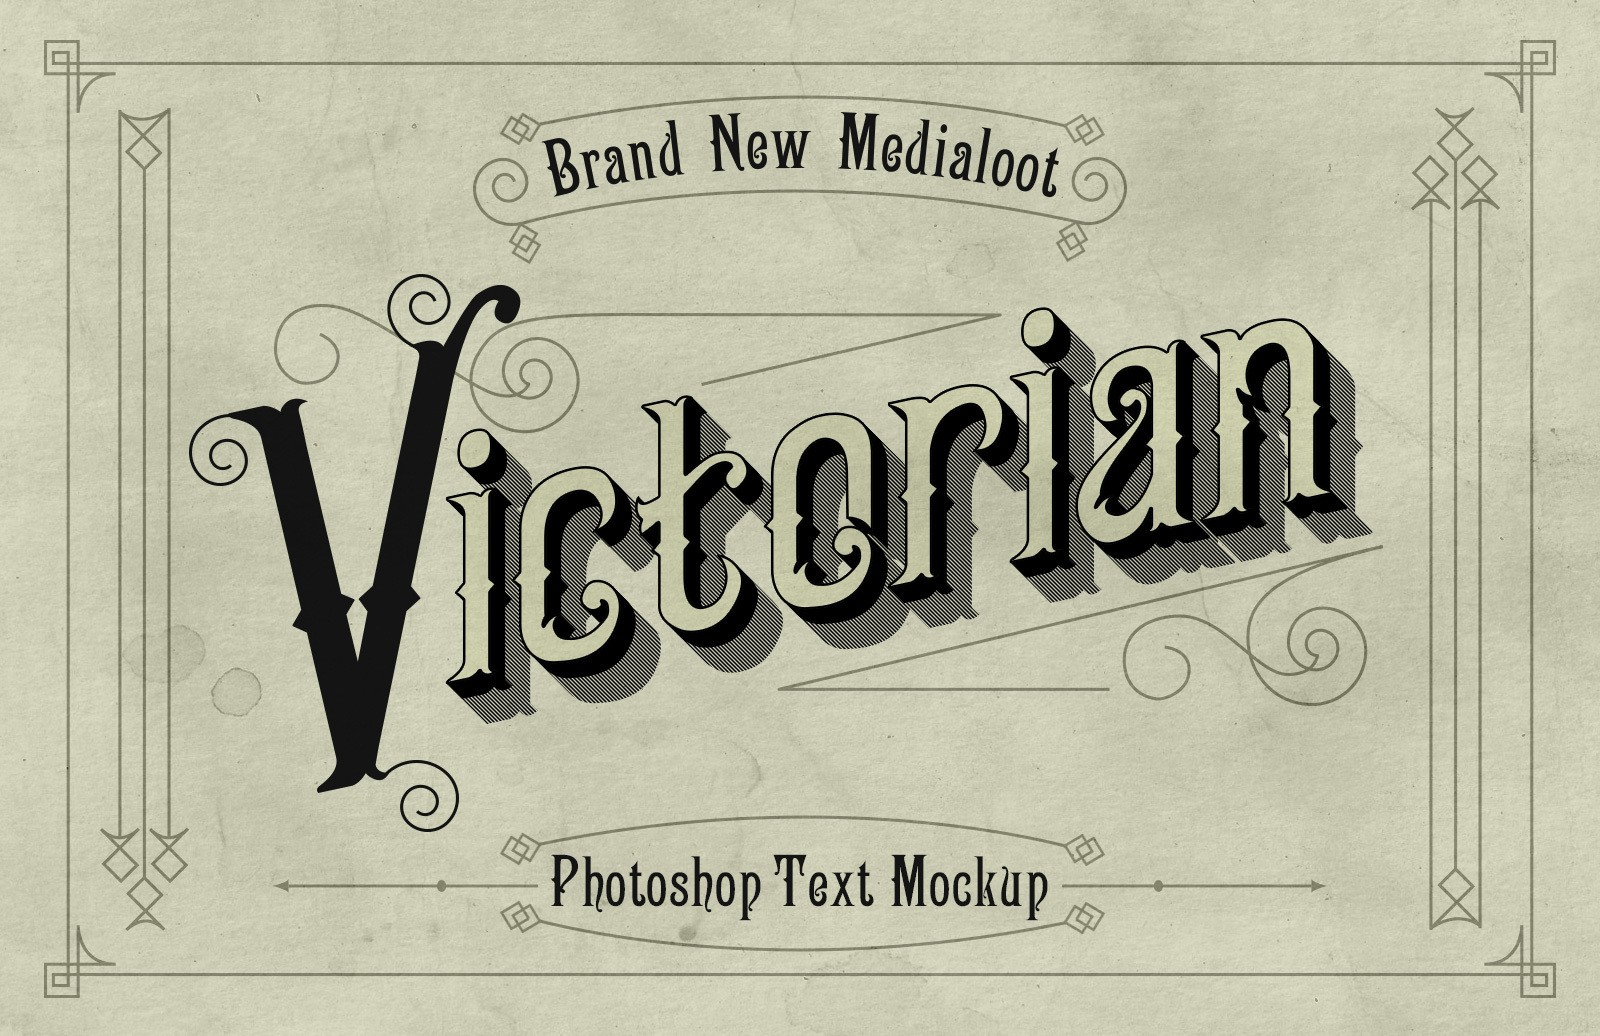 Victorian Text Mockup 1